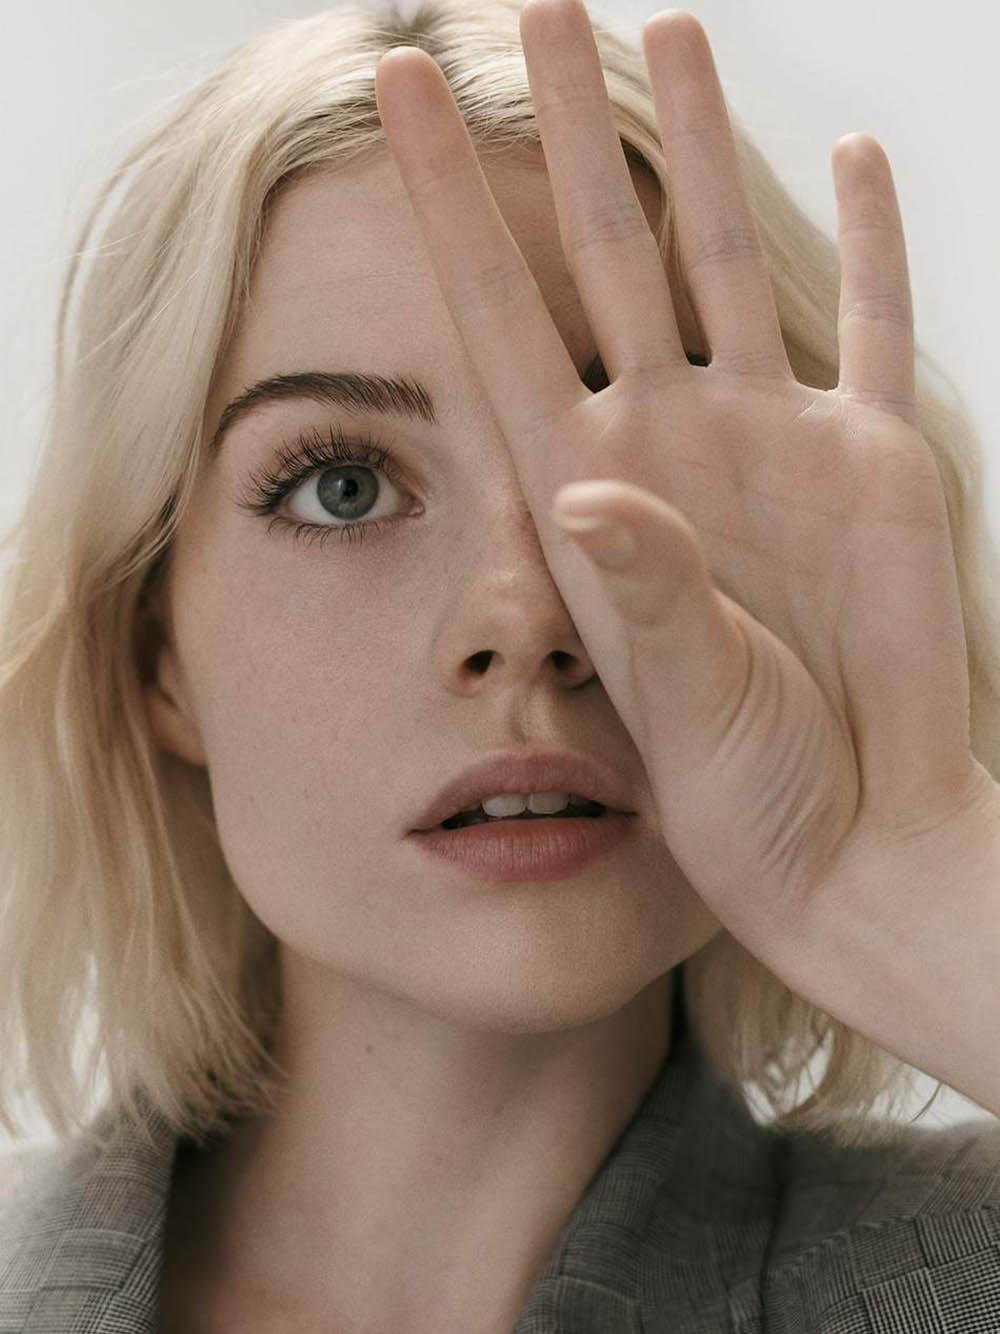 Lucy Boynton covers Porter Edit September 20th, 2019 by Nicolas Kantor